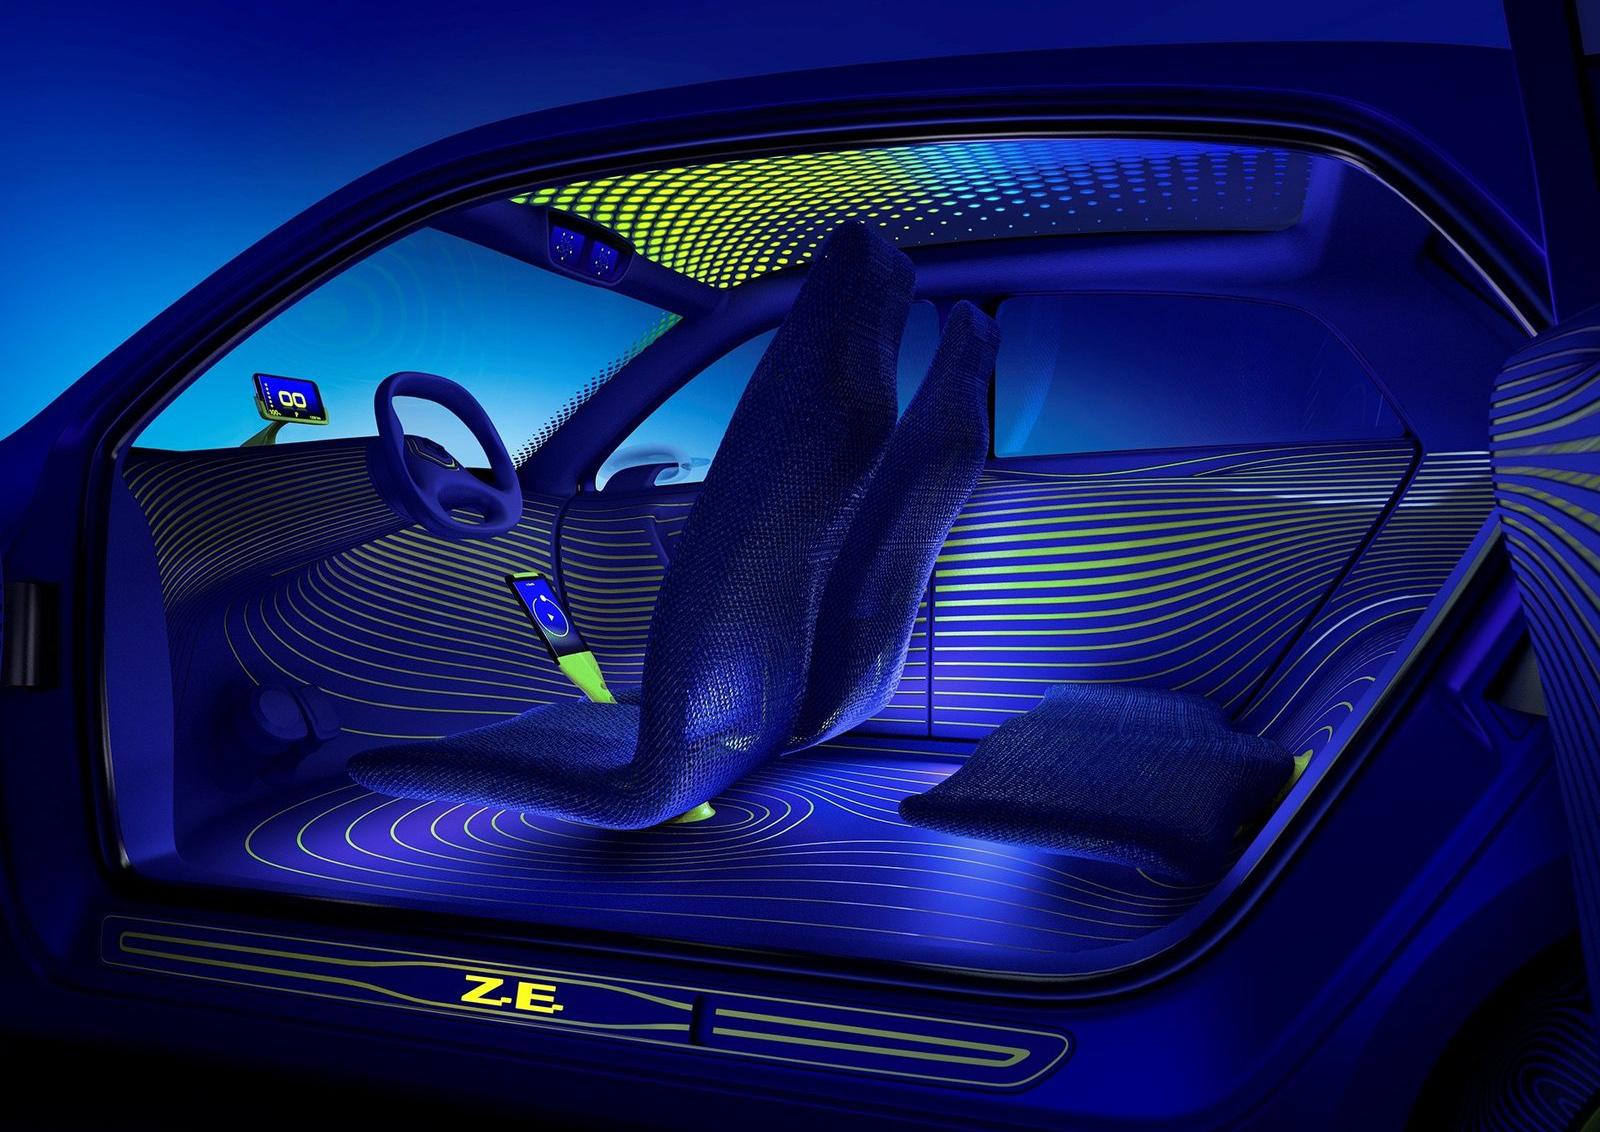 Renault-Twin-Z_Concept_2013_1600x1200_wallpaper_1c